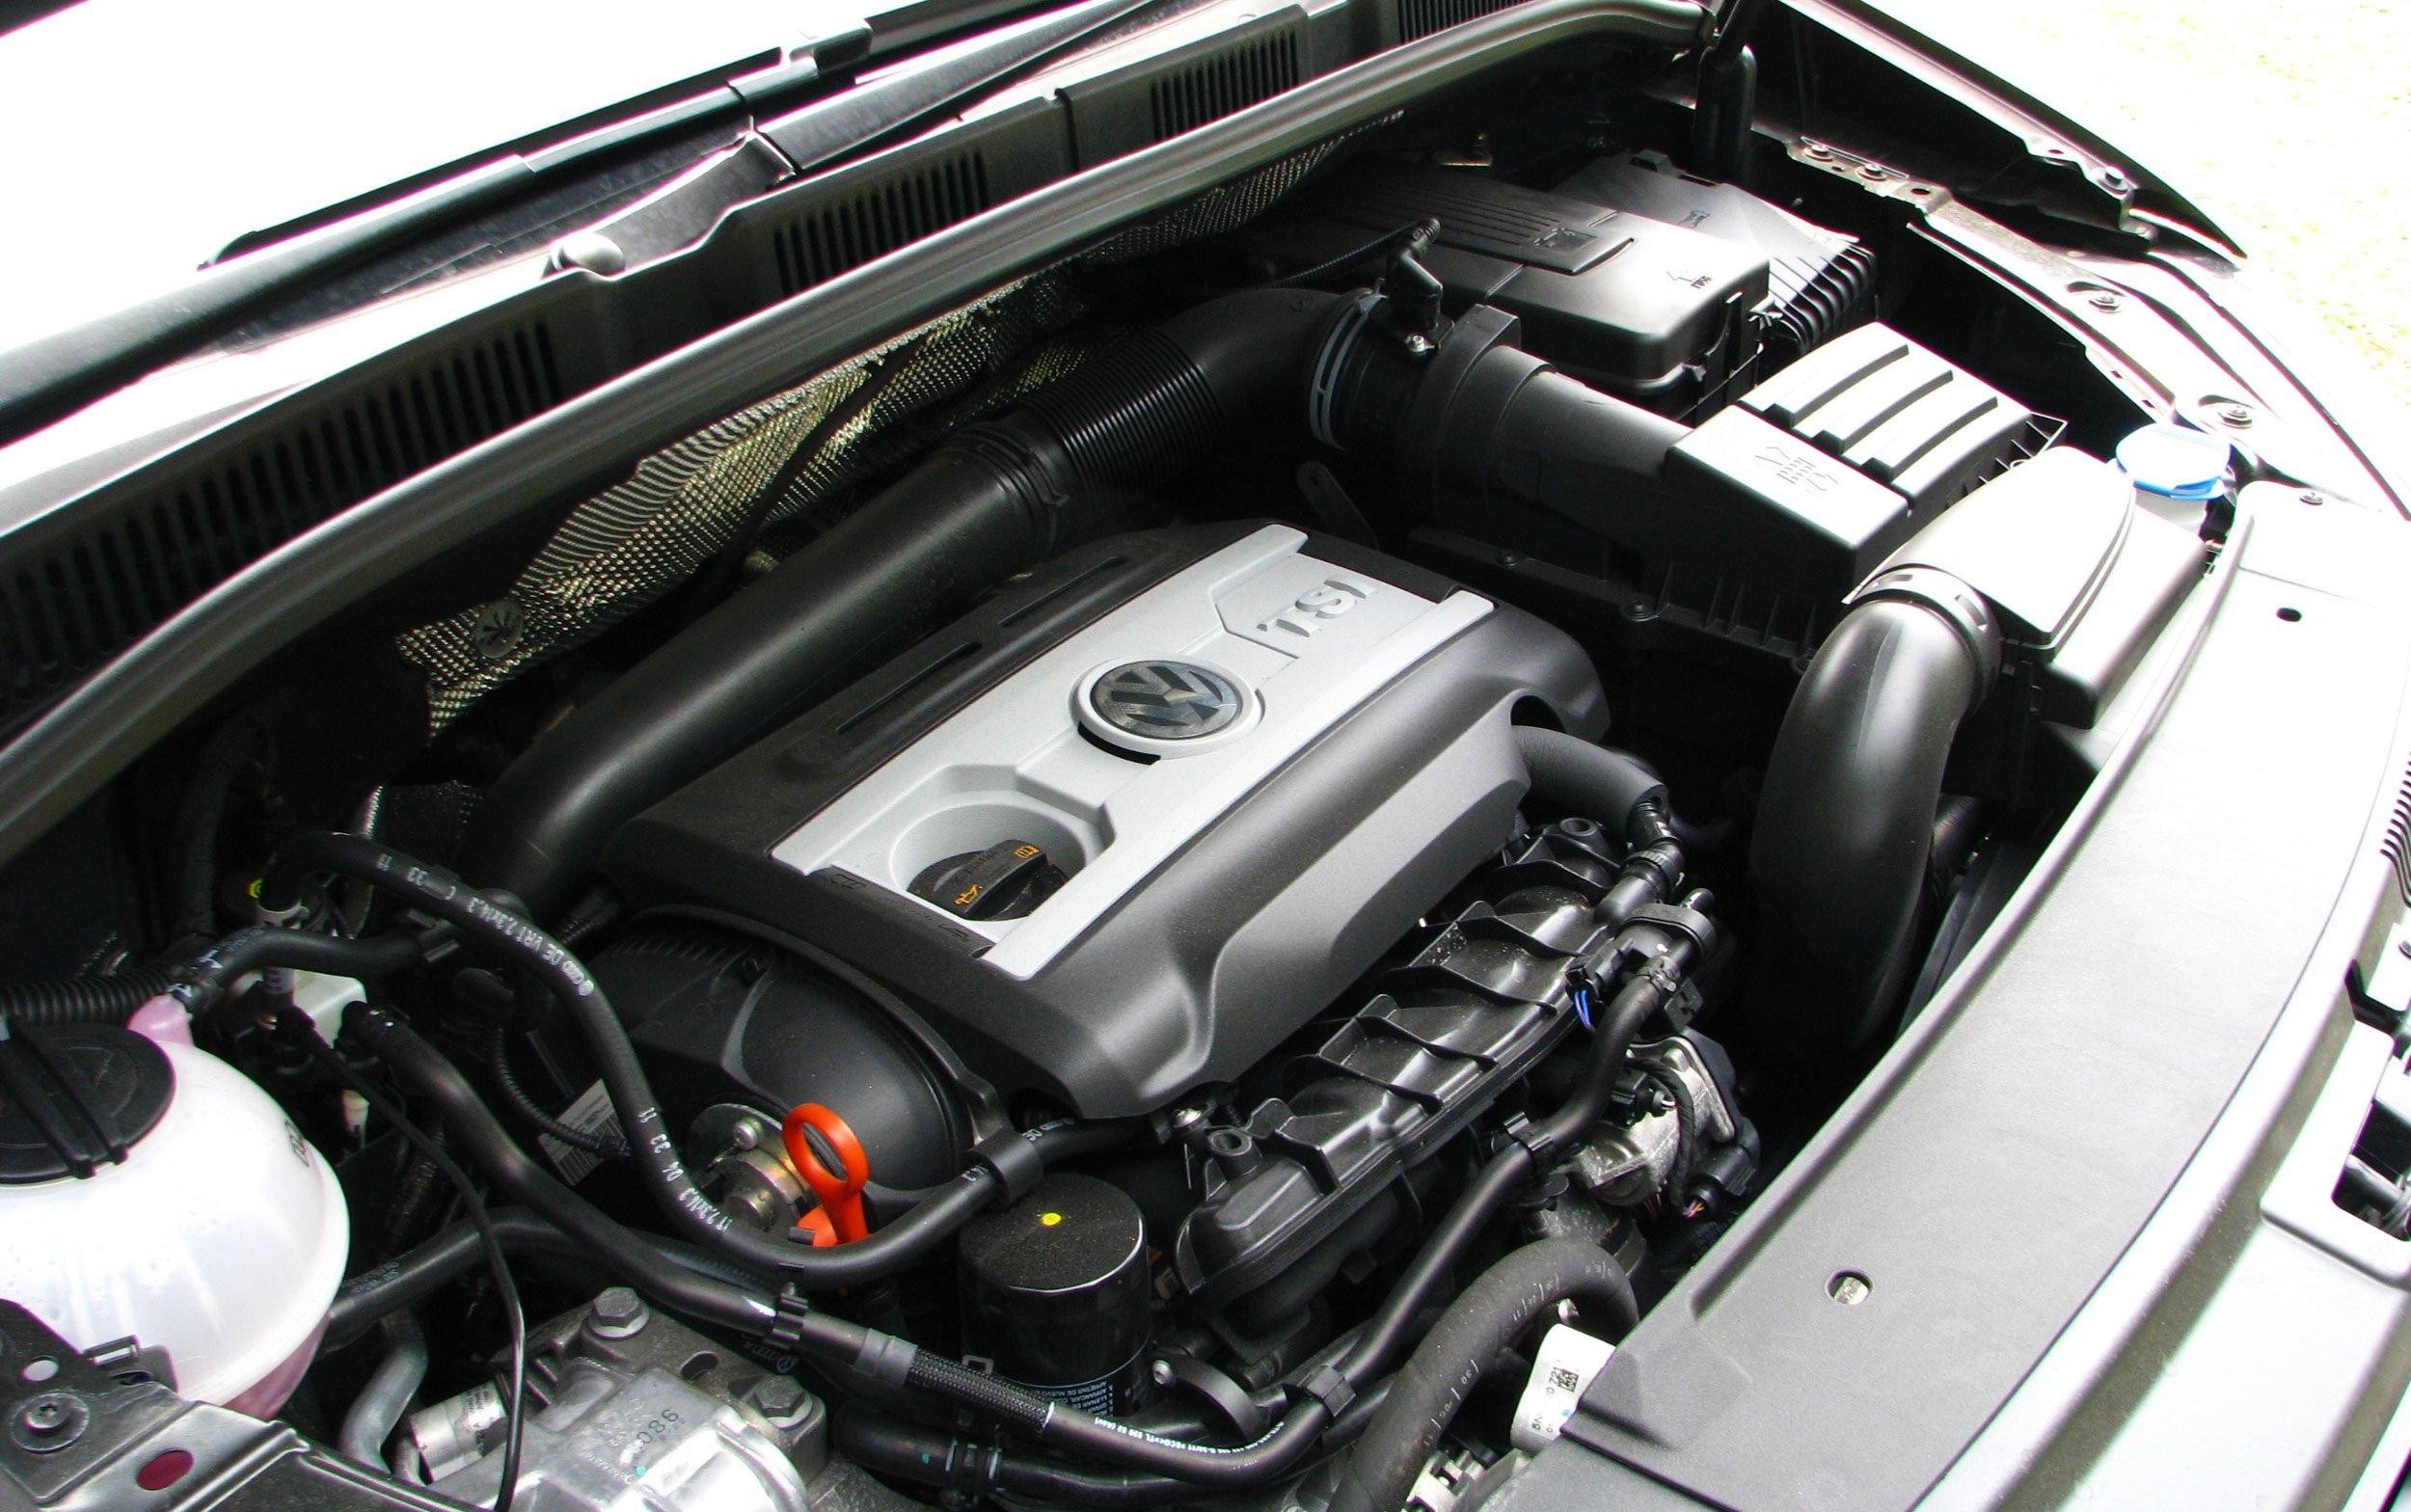 Volkswagen Sharan 2 0 Tsi Test Drive Review Image 150551